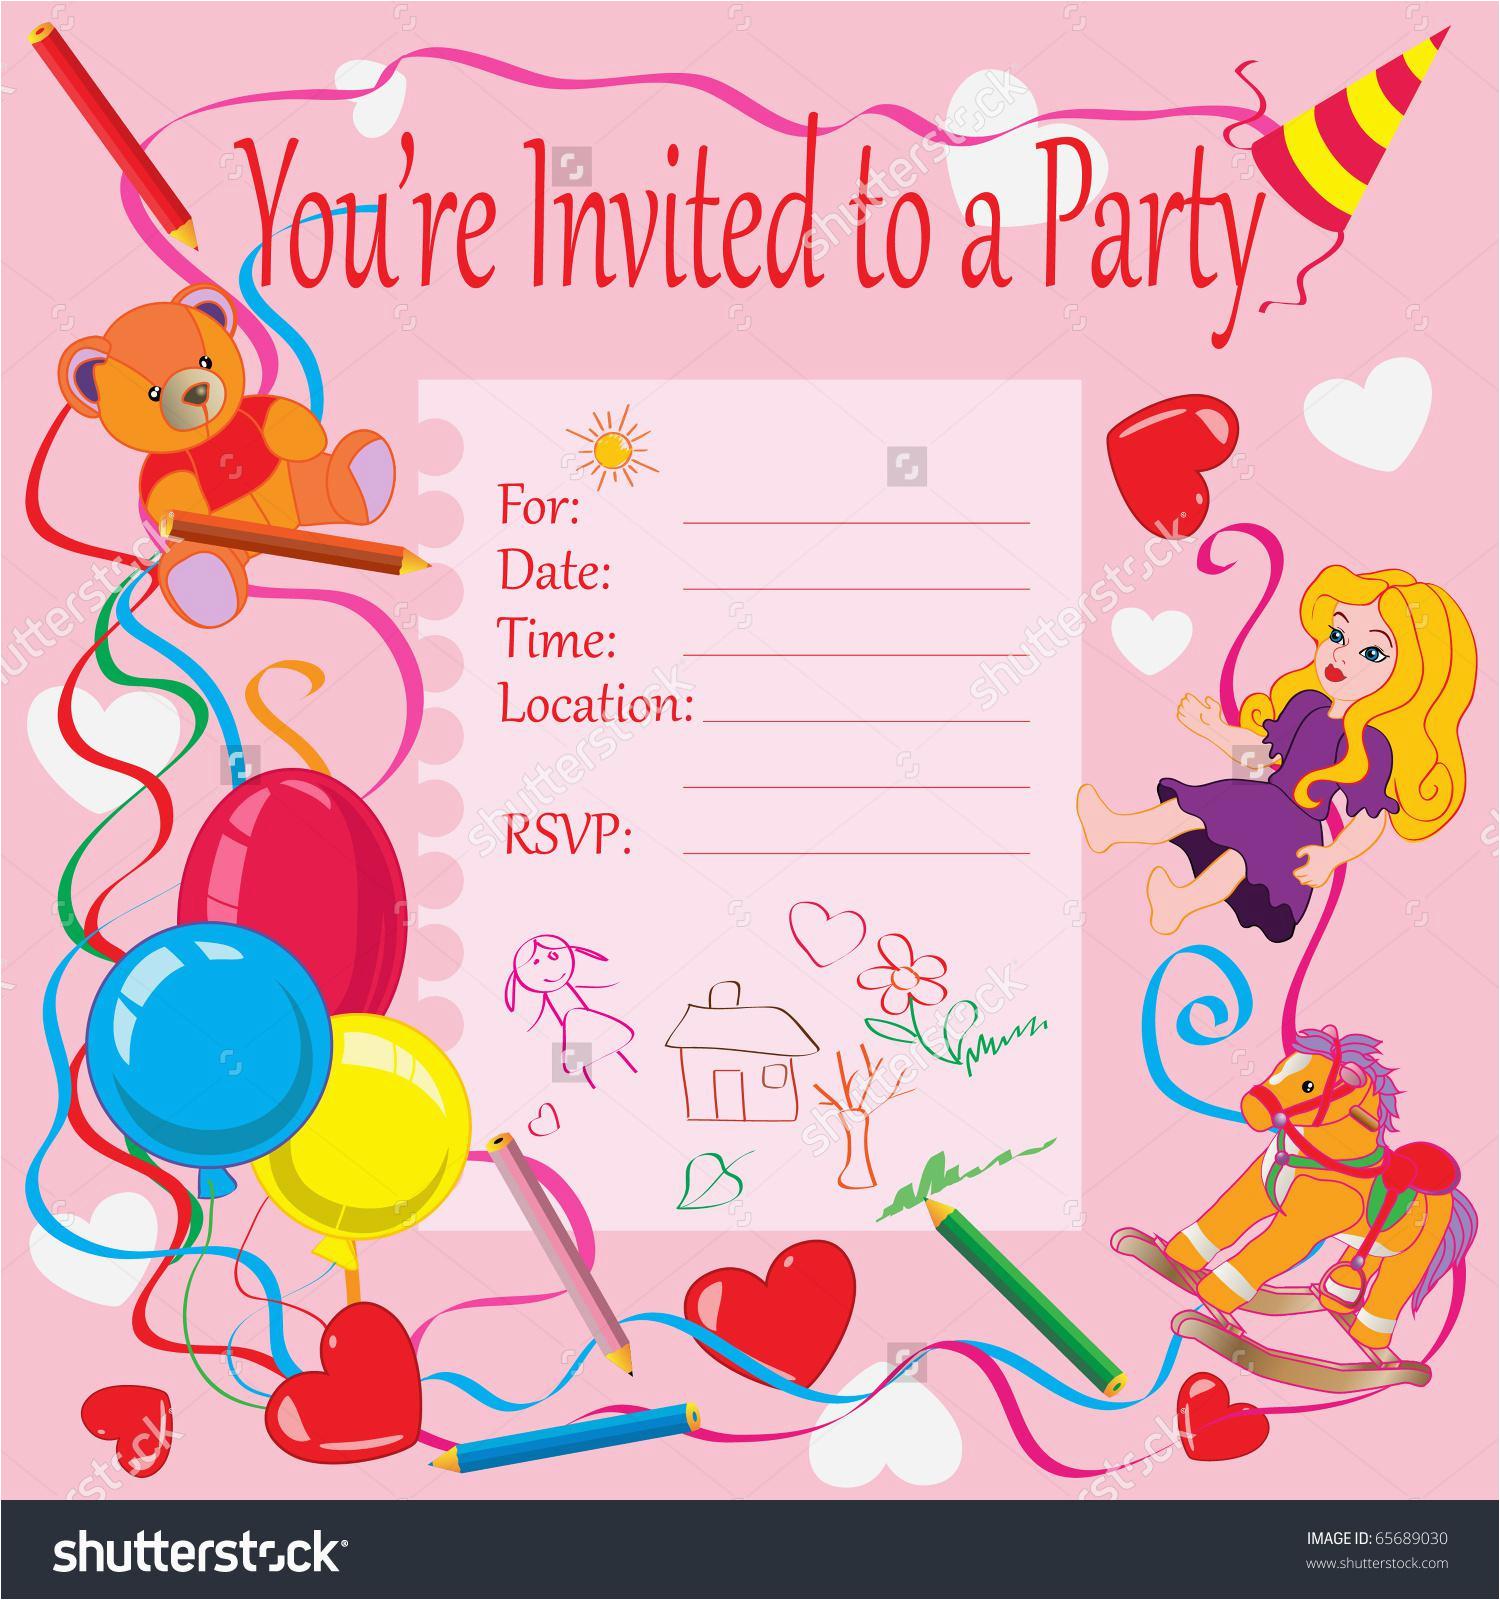 20 birthday invitations cards sample wording printable